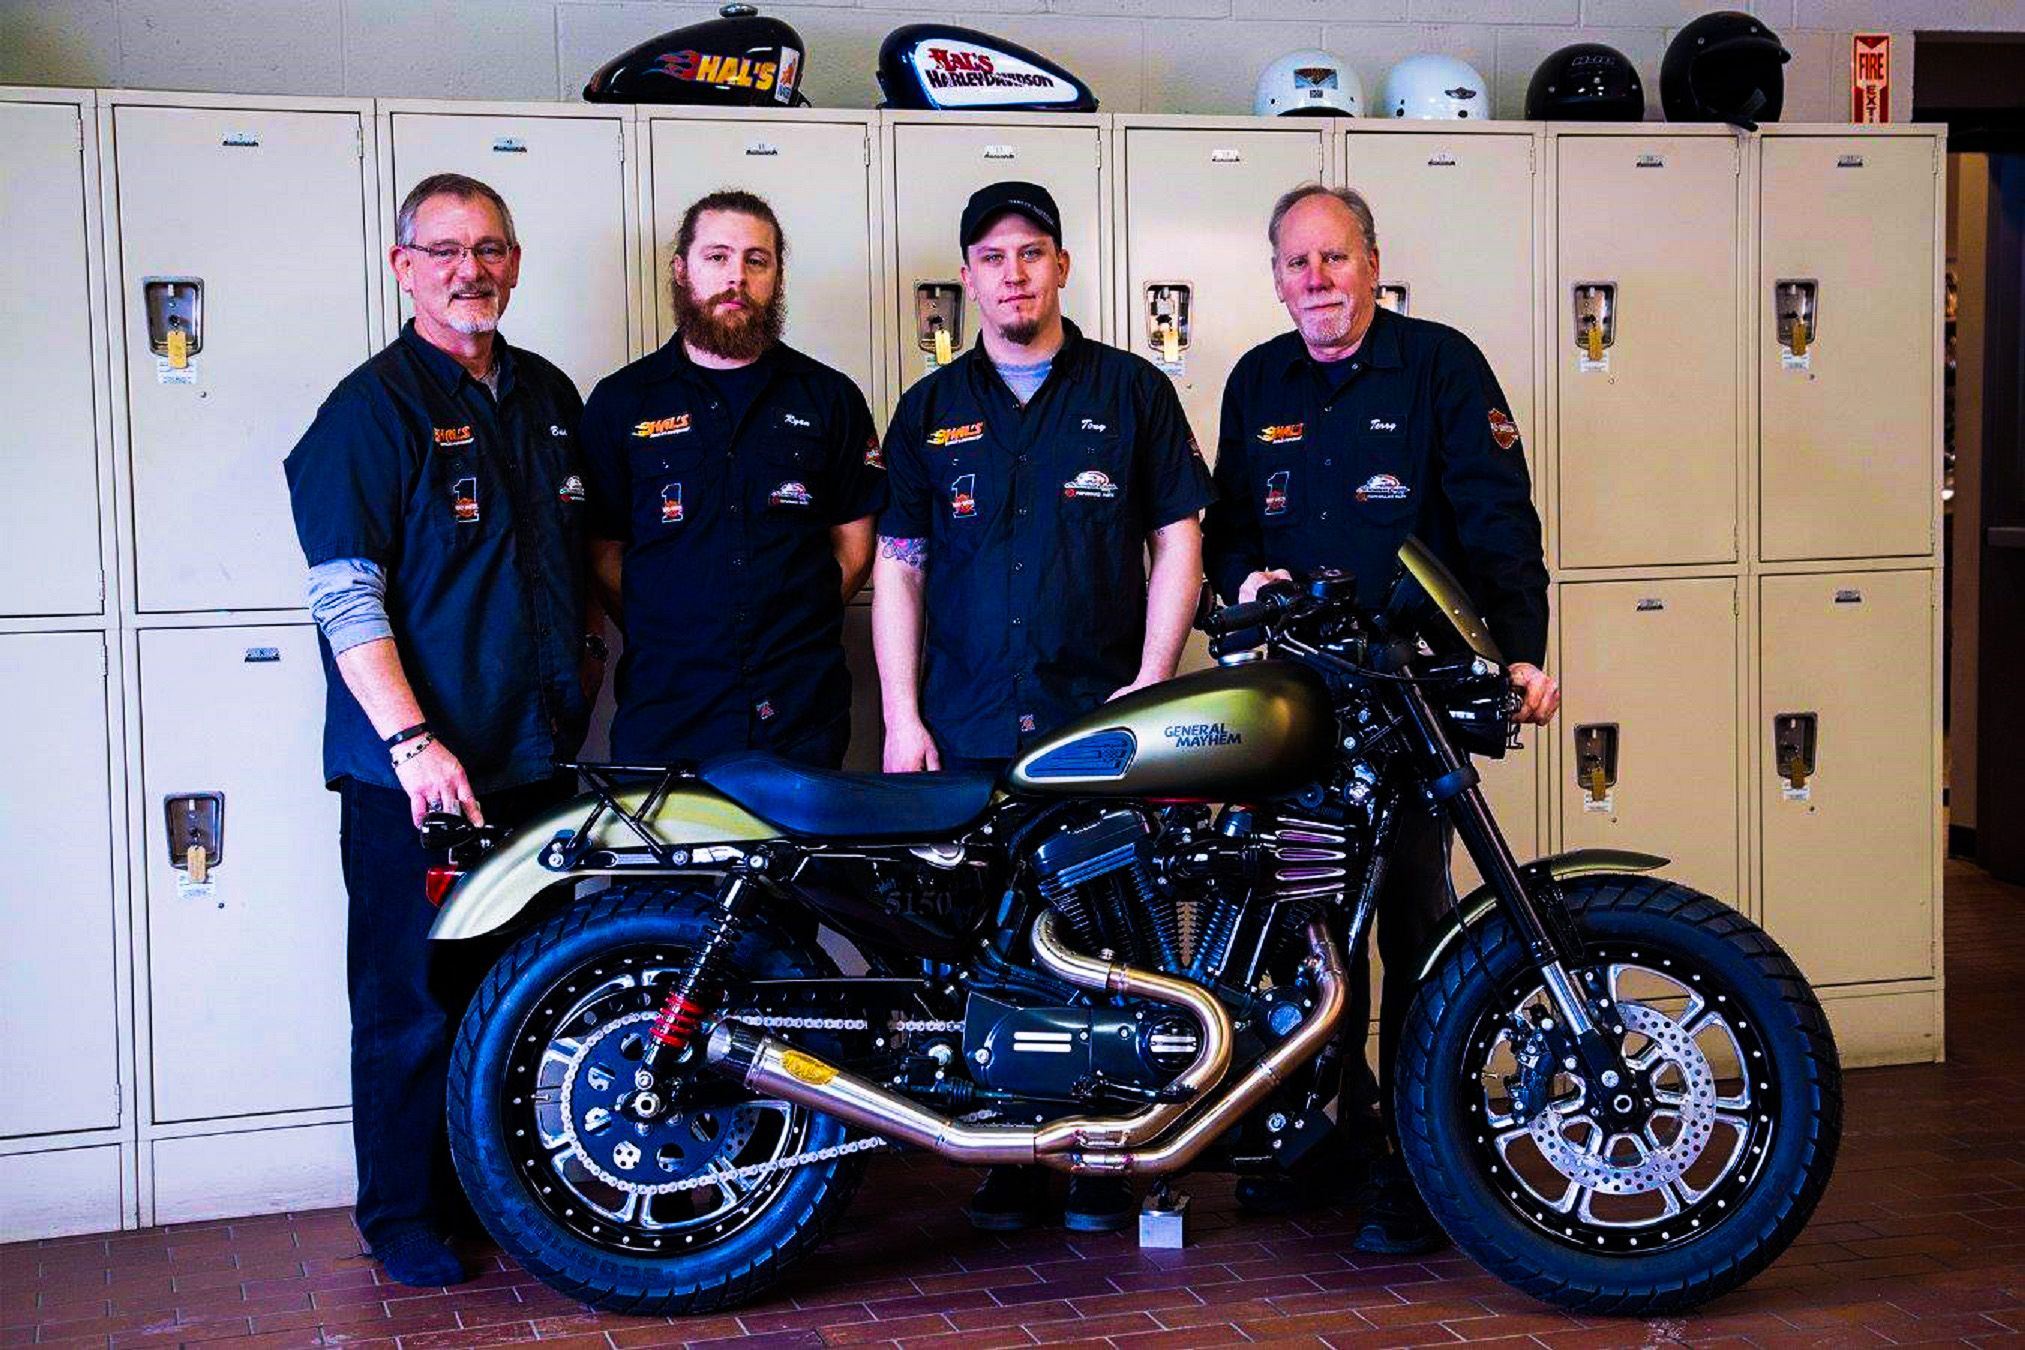 Hal's Harley-Davidson New Berlin, Wisconsin - 2015 H-D® Sportster